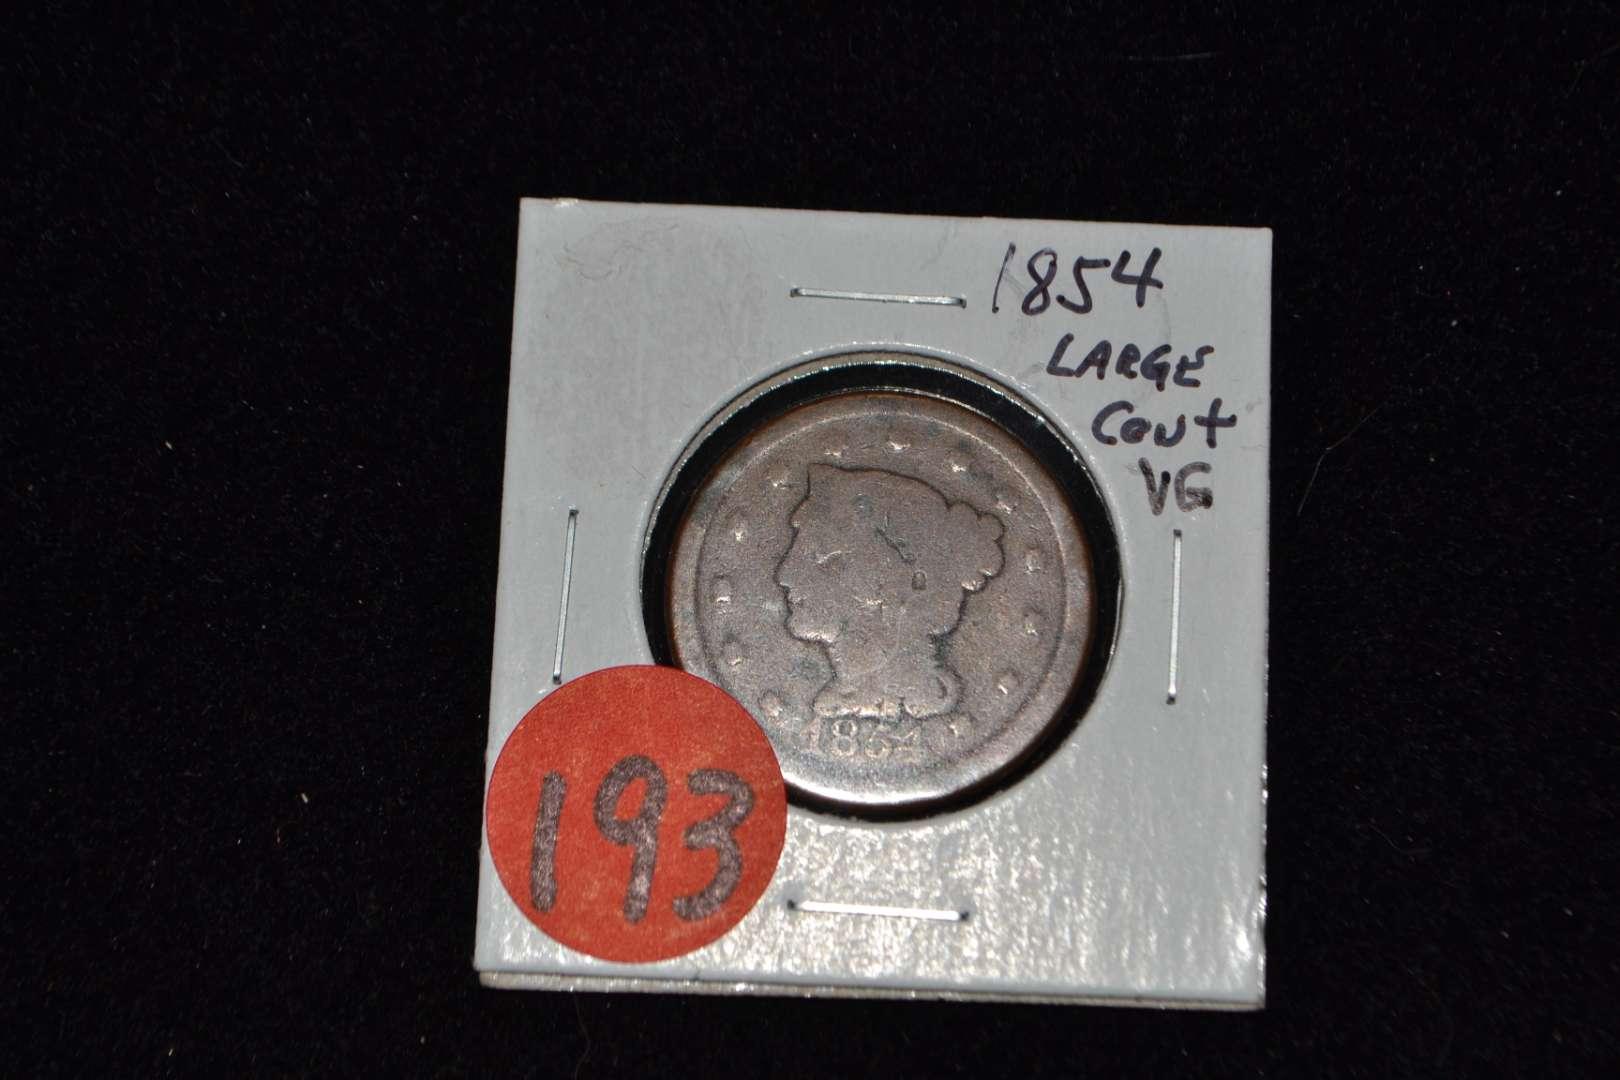 Lot # 193 1854 VG LARGE CENT